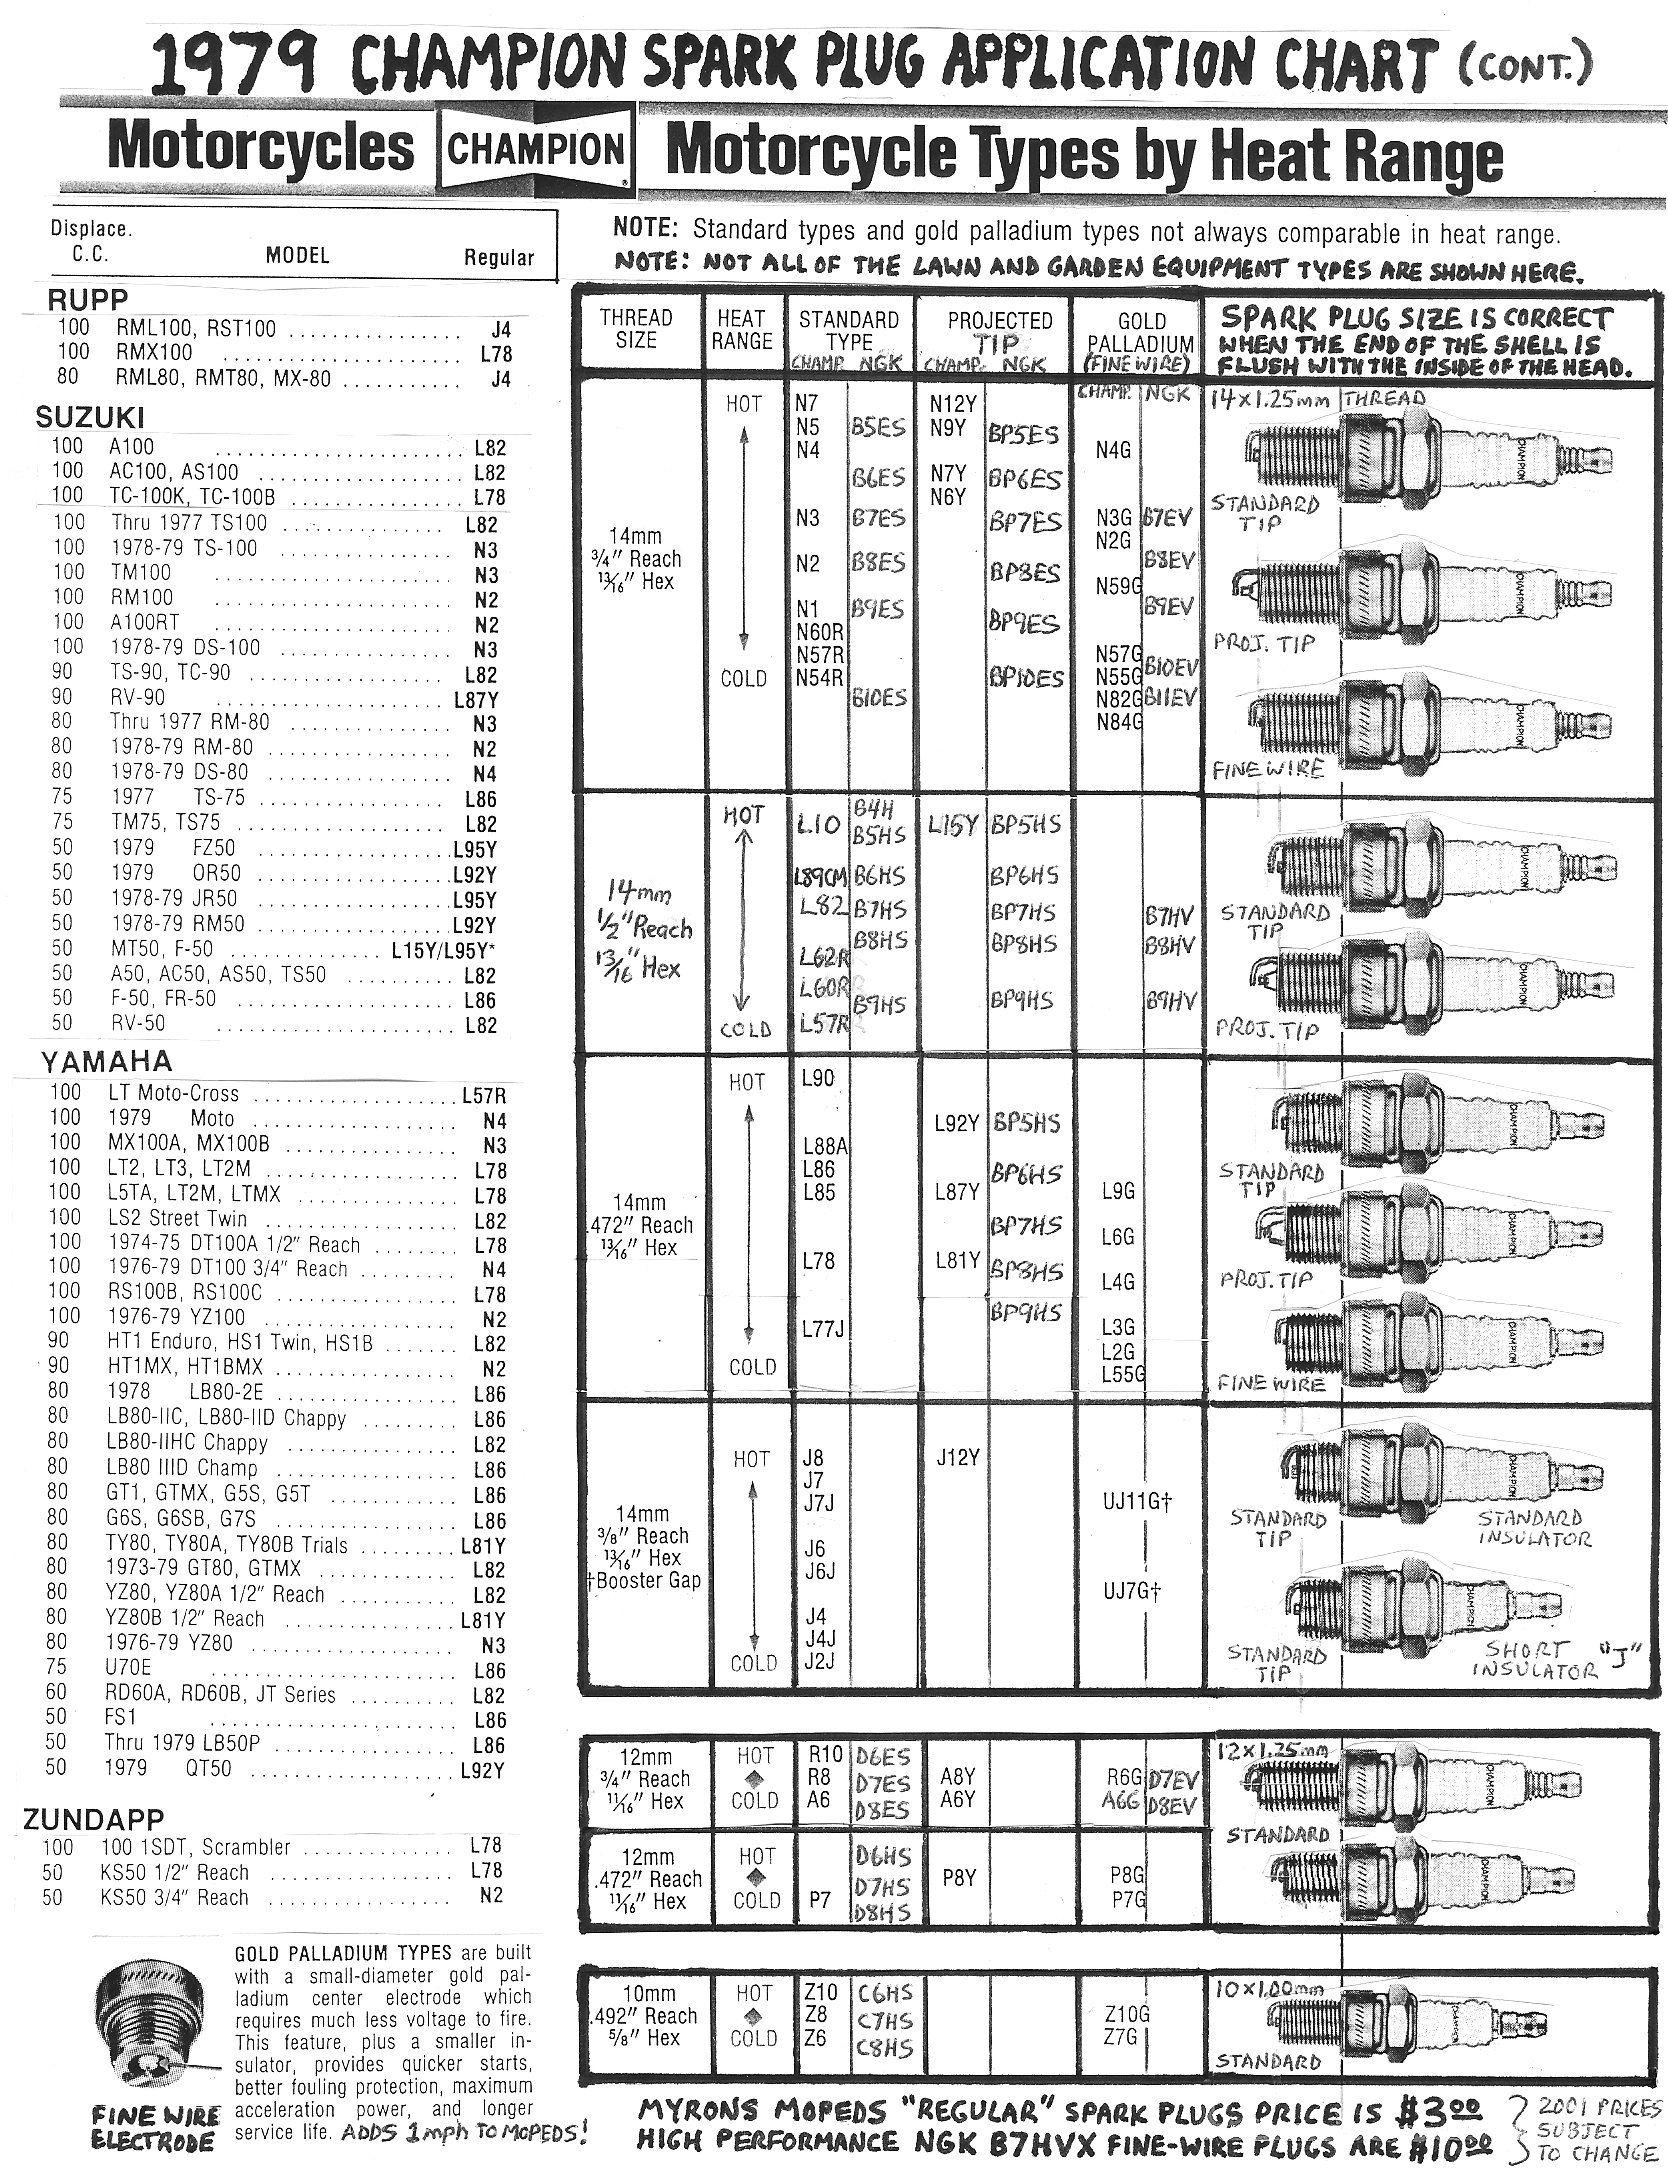 1979-Spark-Plug-Chart-page-3.jpg (1668×2172) | My Moped | Pinterest on spark plug relay, spark plugs yamaha venture 1200, spark plug fuse, spark plug wire, spark plug plug, ford ranger spark plug diagram, spark plug operation, spark plug valve, honda spark plugs diagram, spark plug solenoid, 1998 f150 spark plugs diagram, small engine cylinder head diagram, spark plug index, spark plug battery, spark plug bmw, spark plugs for toyota corolla, 2000 camry spark plug diagram, ford expedition spark plug diagram, 2003 ford f150 spark plug numbering diagram, 1999 gmc denali spark plug diagram,